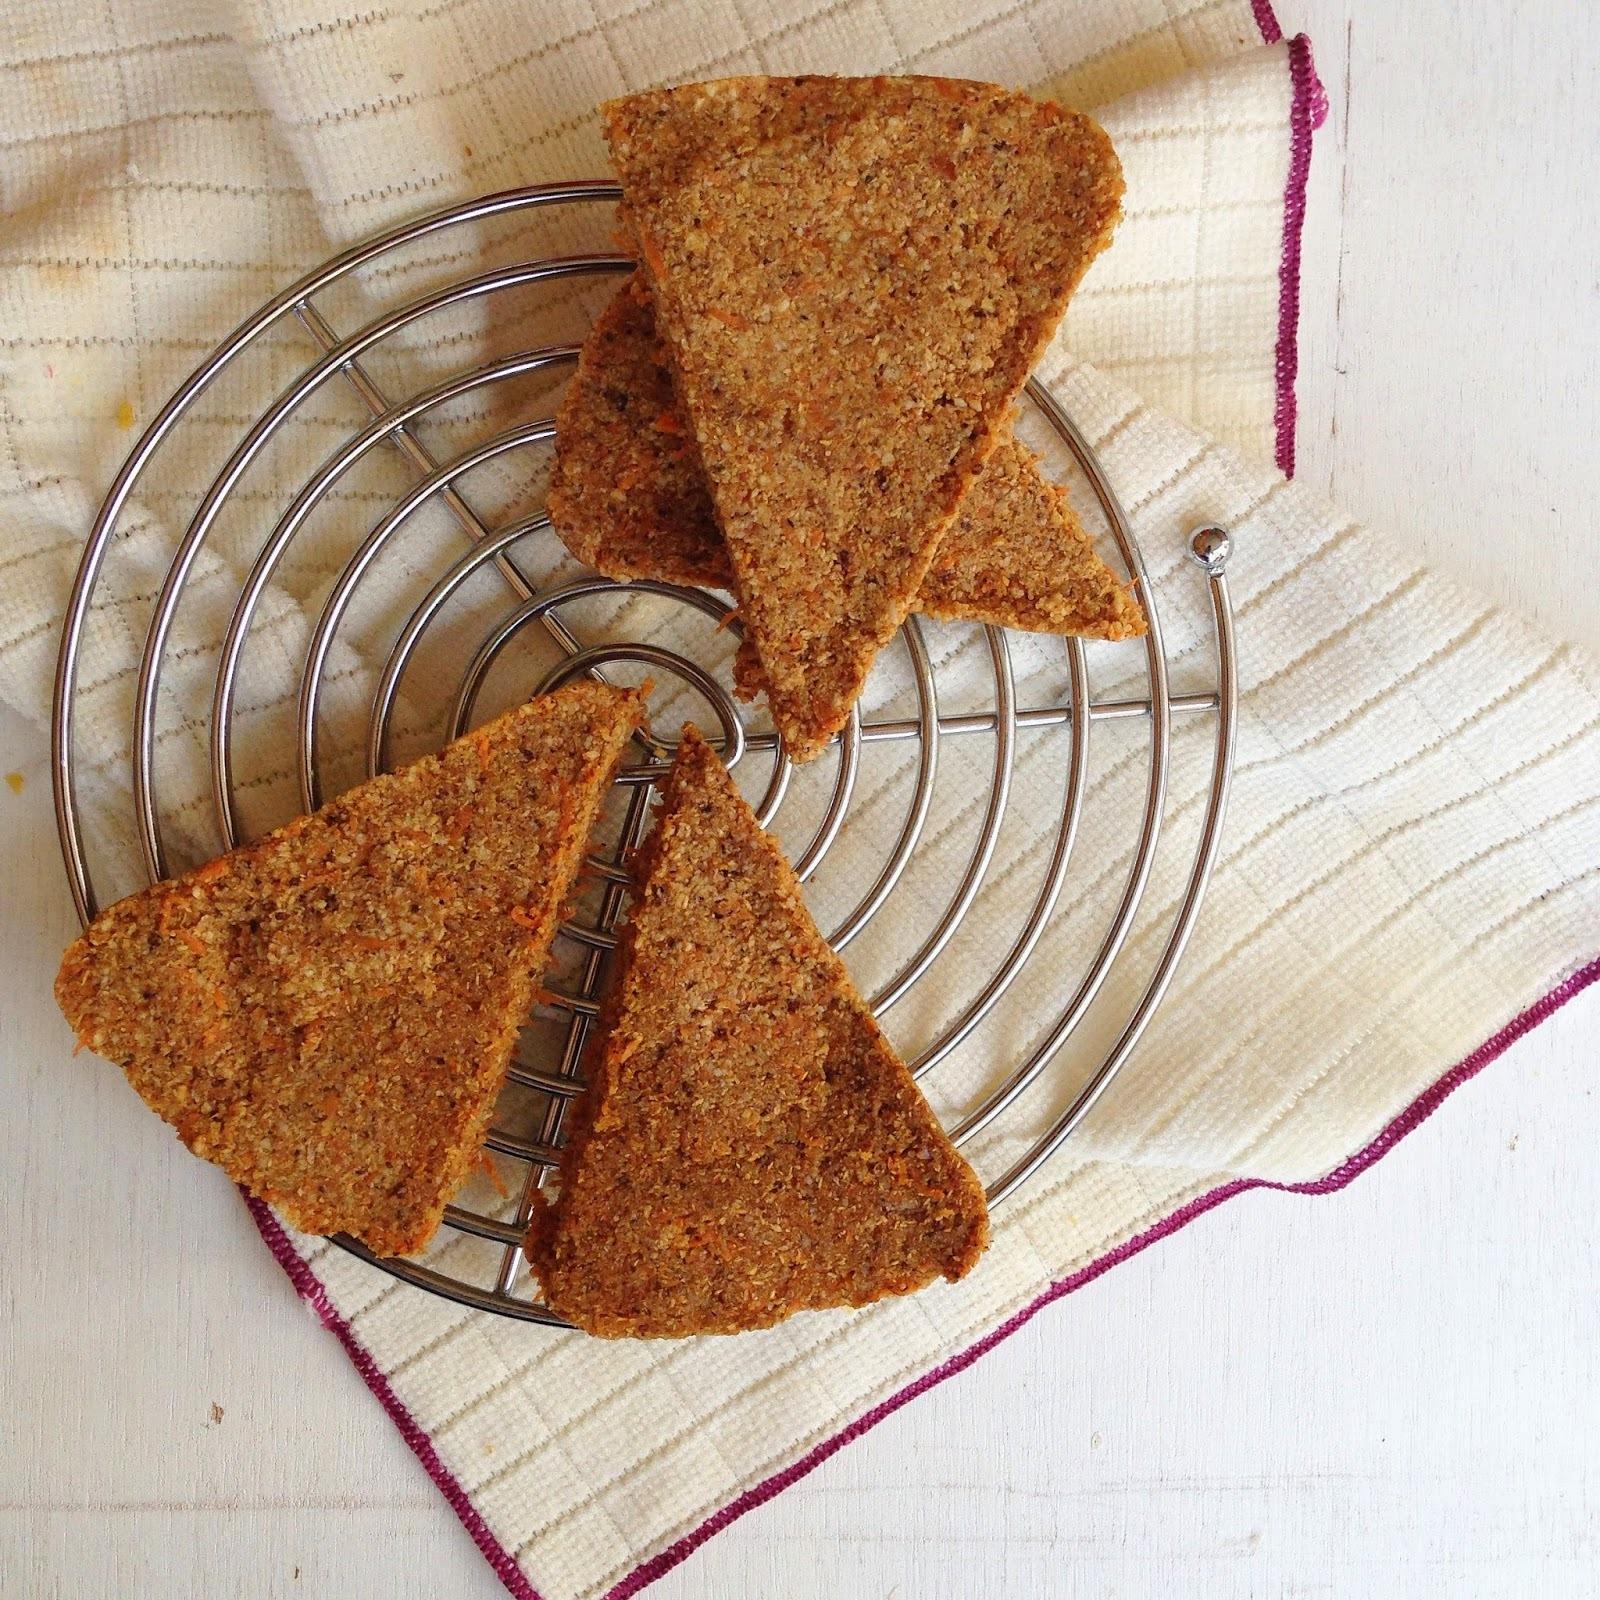 Semana de la torta: Carrot cake crudivegano